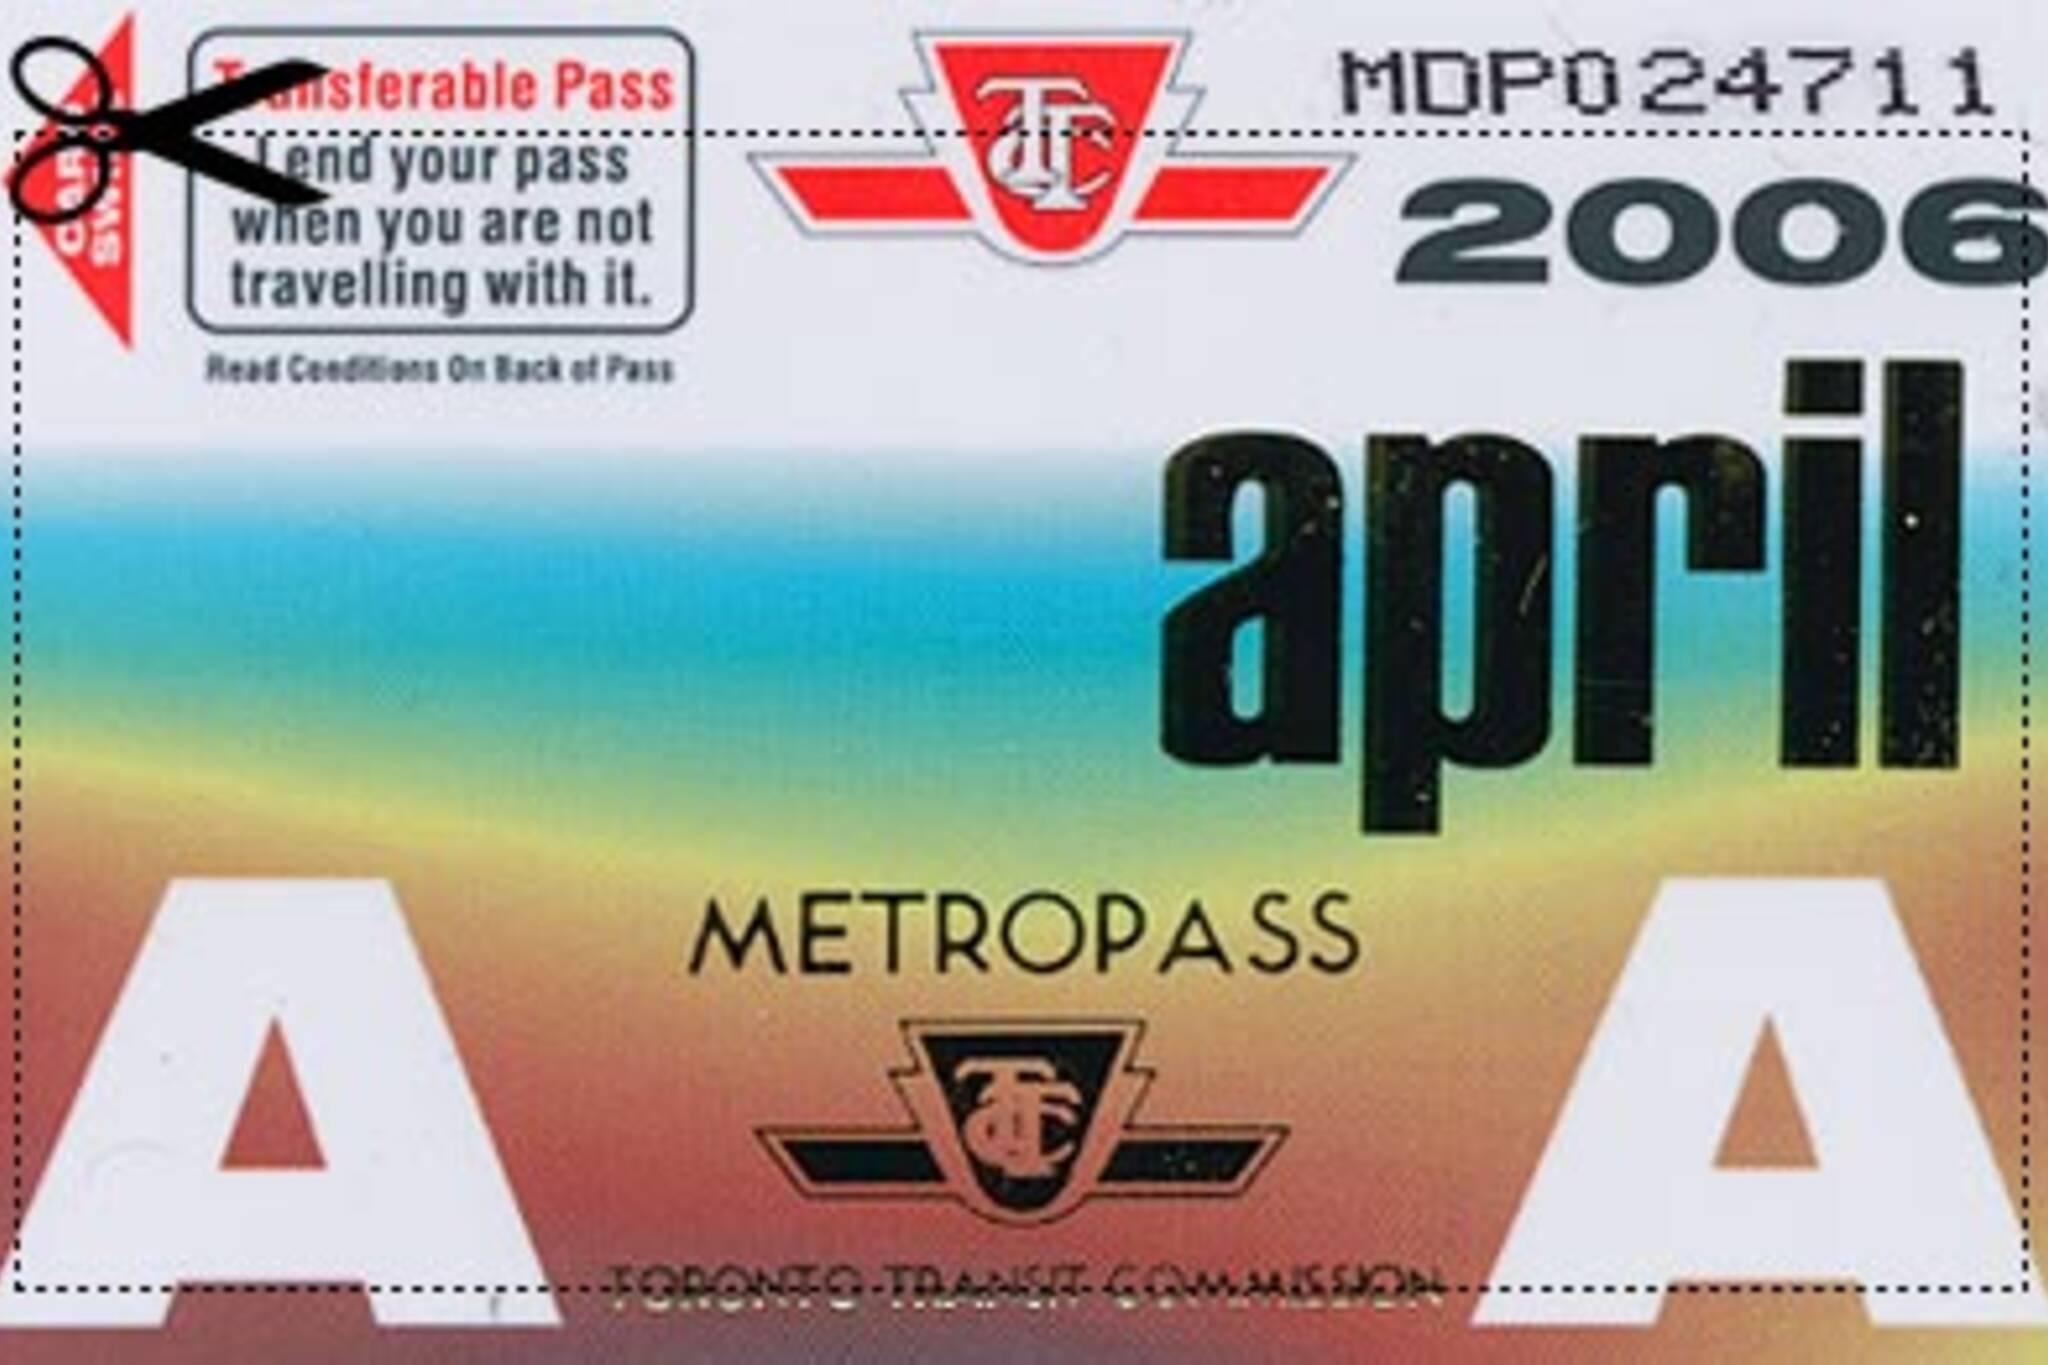 Metropass Affinity Program